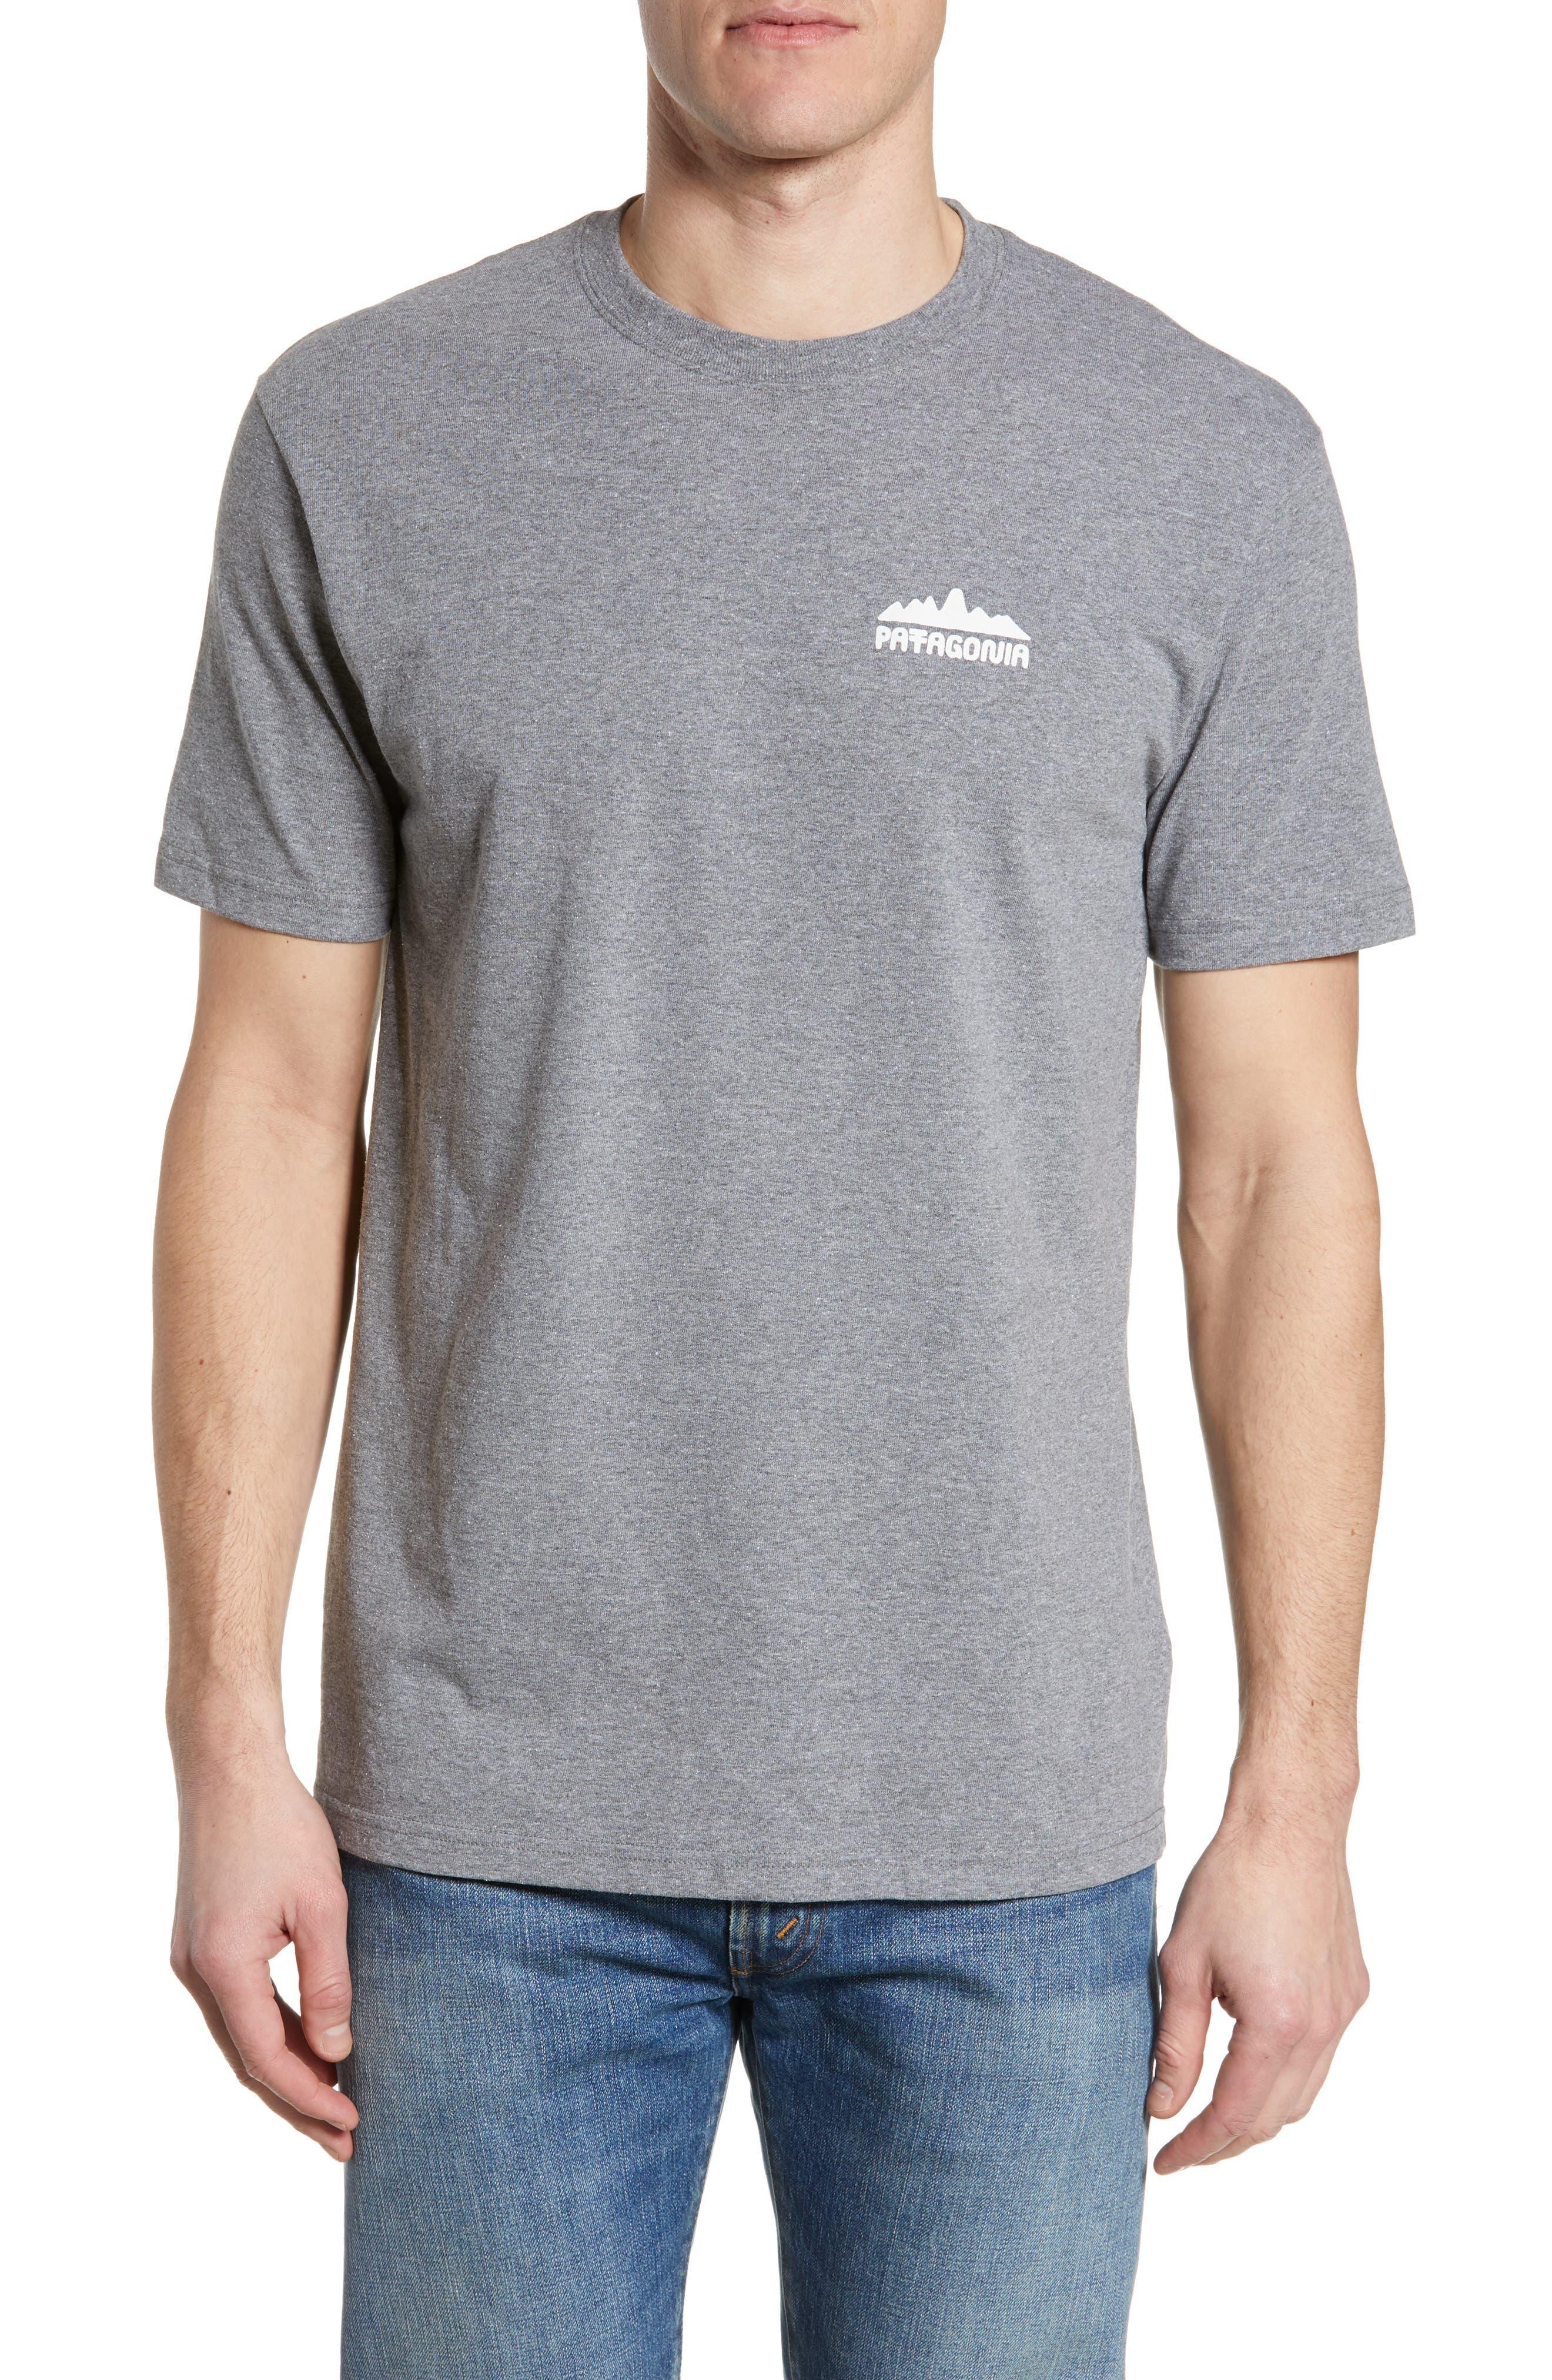 Patagonia Partyledge Responsibili-Tee T-Shirt, Grey